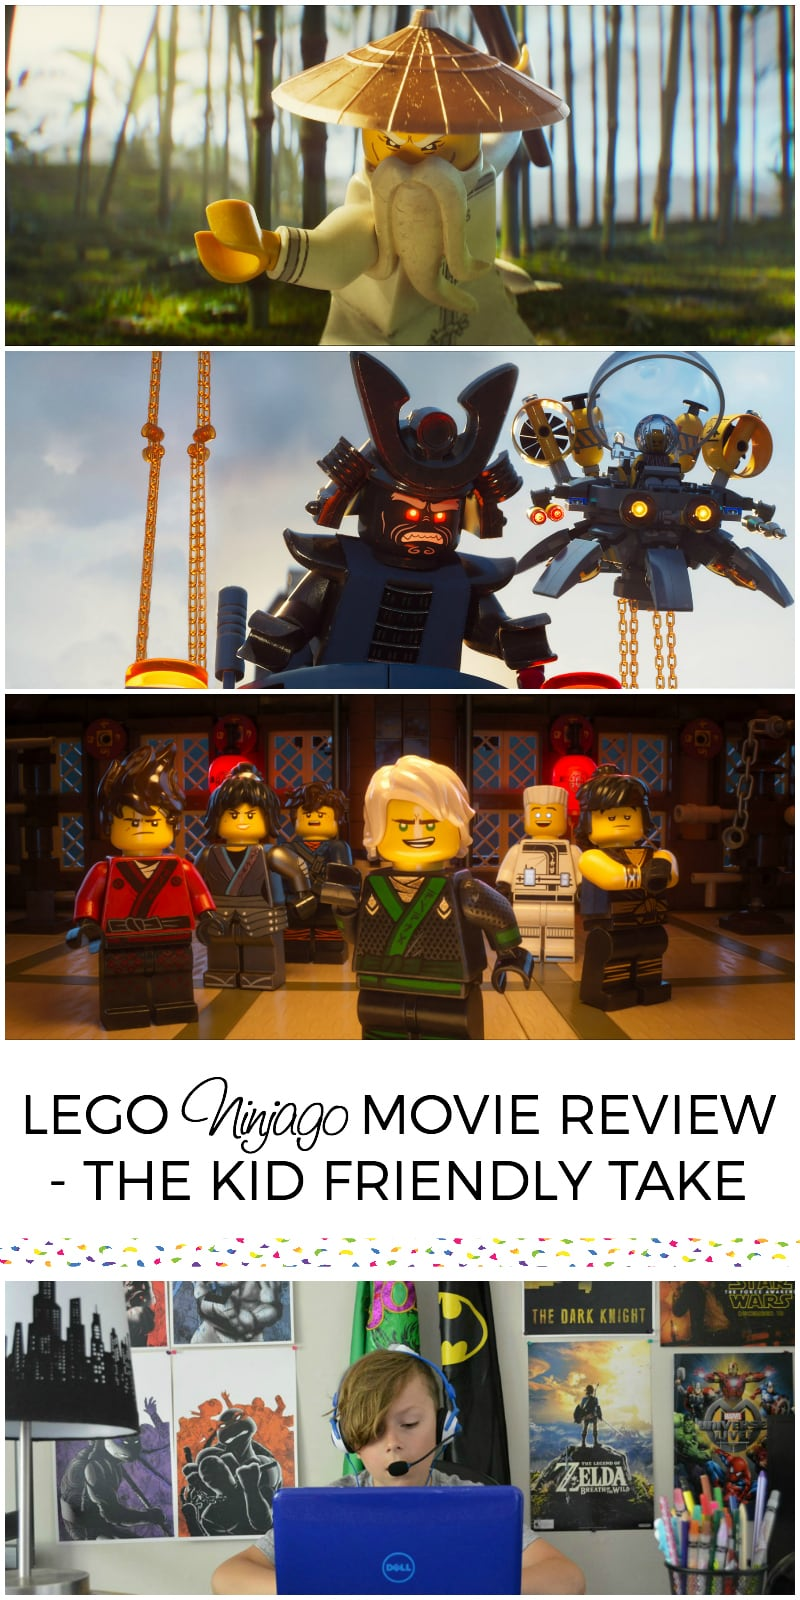 LEGO Ninjago Movie Review - The Kid Friendly Take